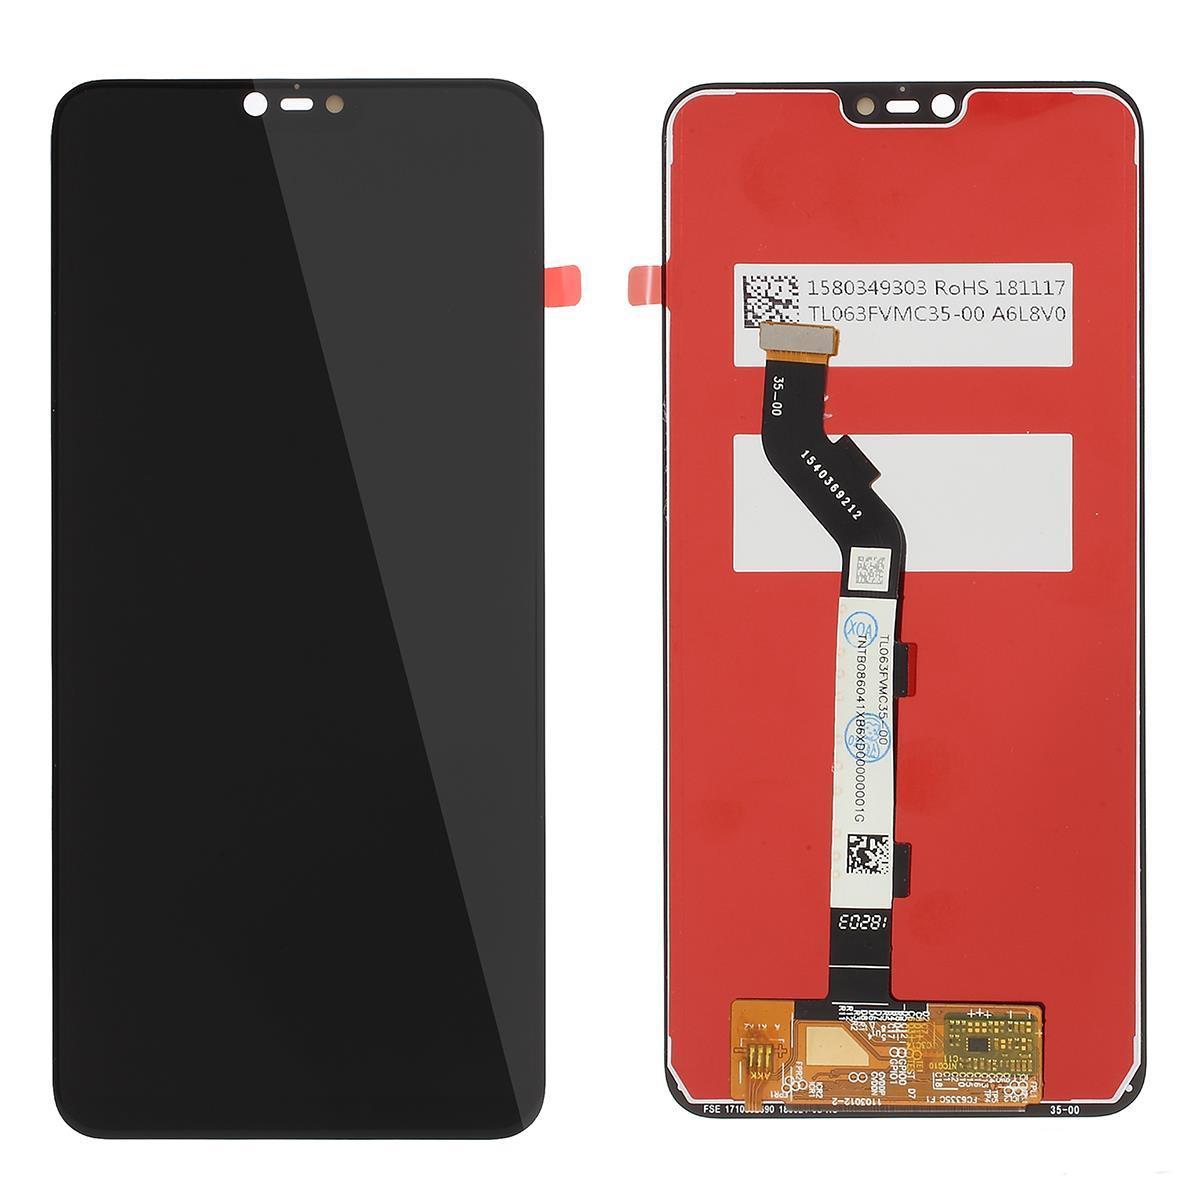 ال سی دی شیائومی می ۸ لایت - LCD XIAOMI Mi 8 Lite